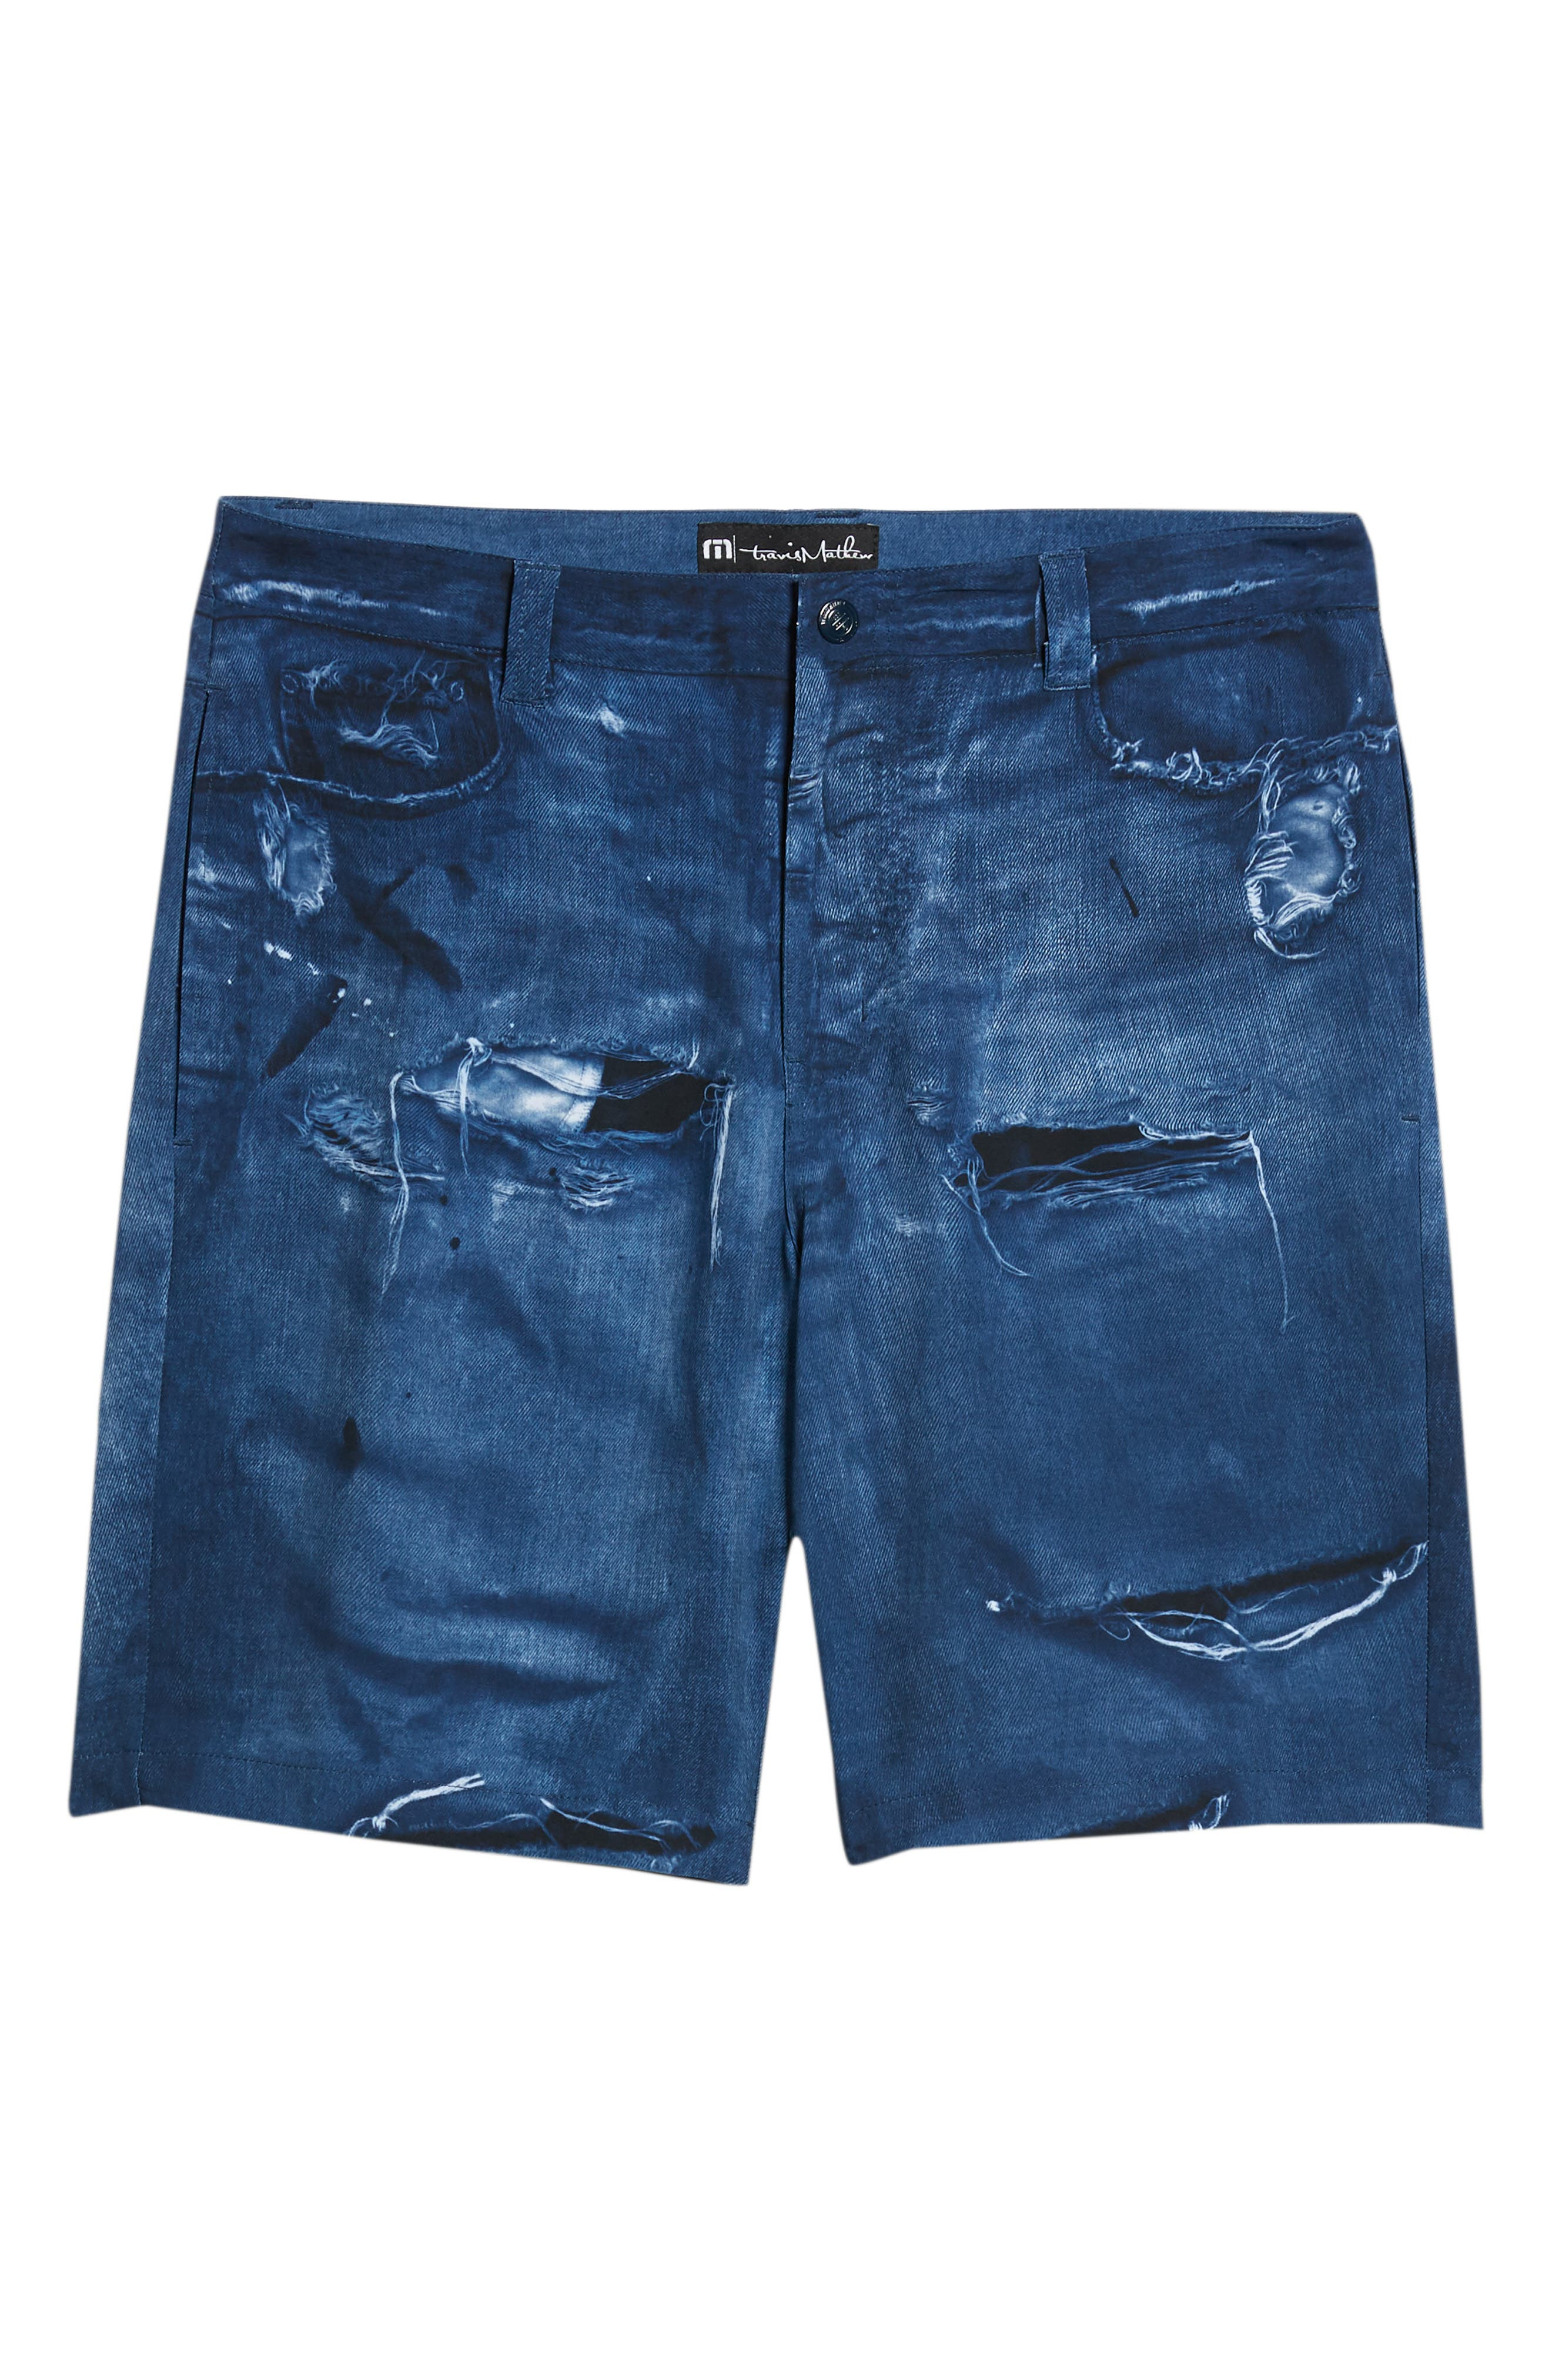 Man o' War Regular Fit Shorts,                             Alternate thumbnail 6, color,                             DENIM